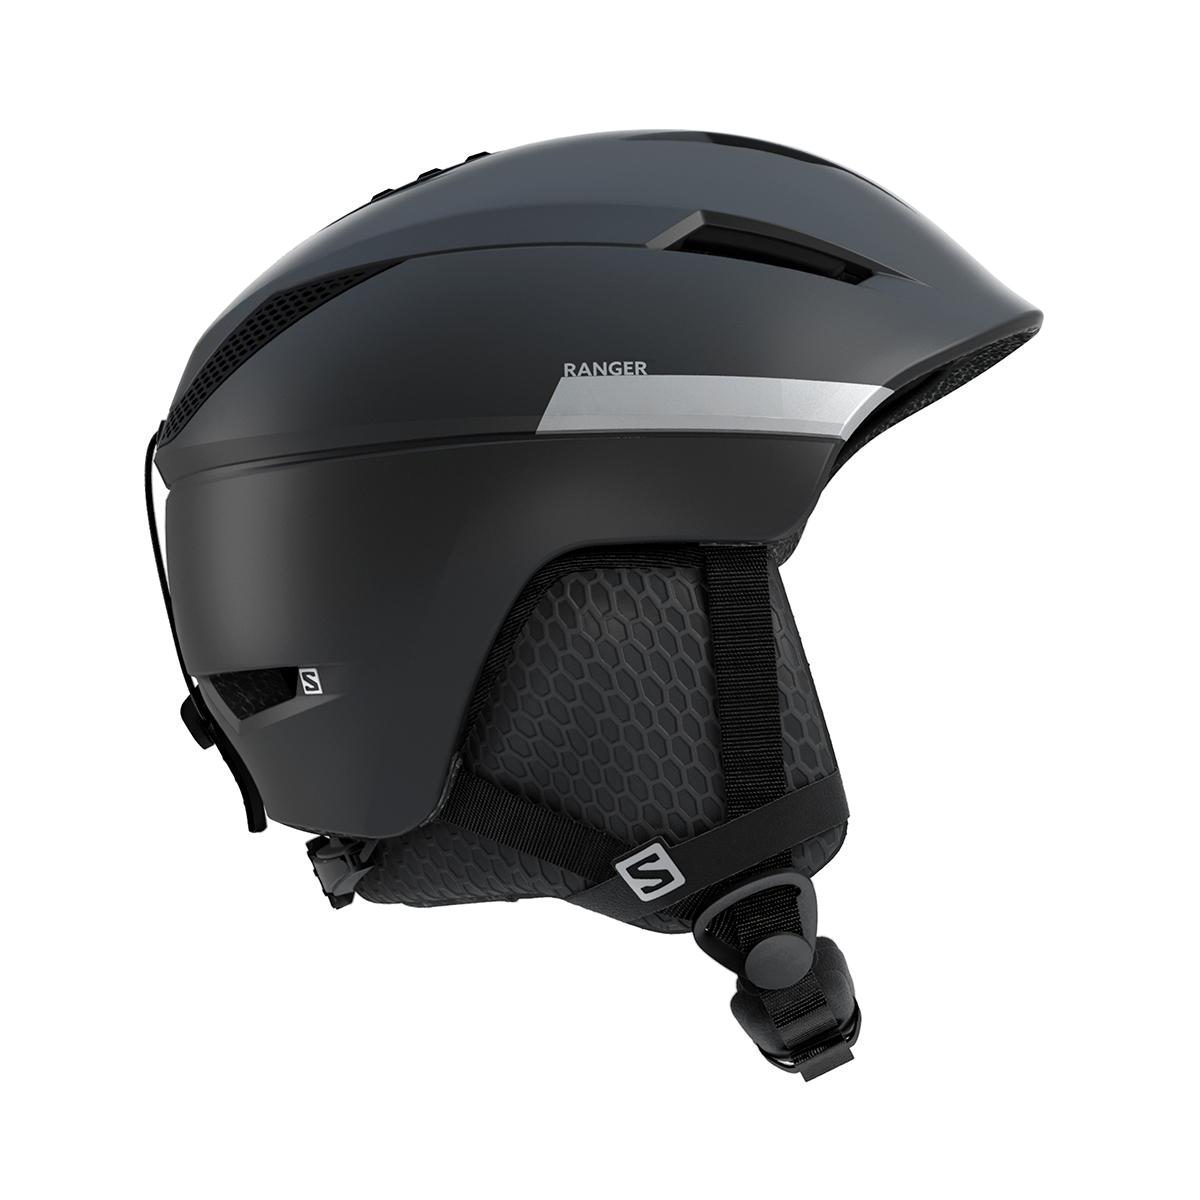 _PREMANUFACTURE_PRICE Salomon casco ranger 2 mips